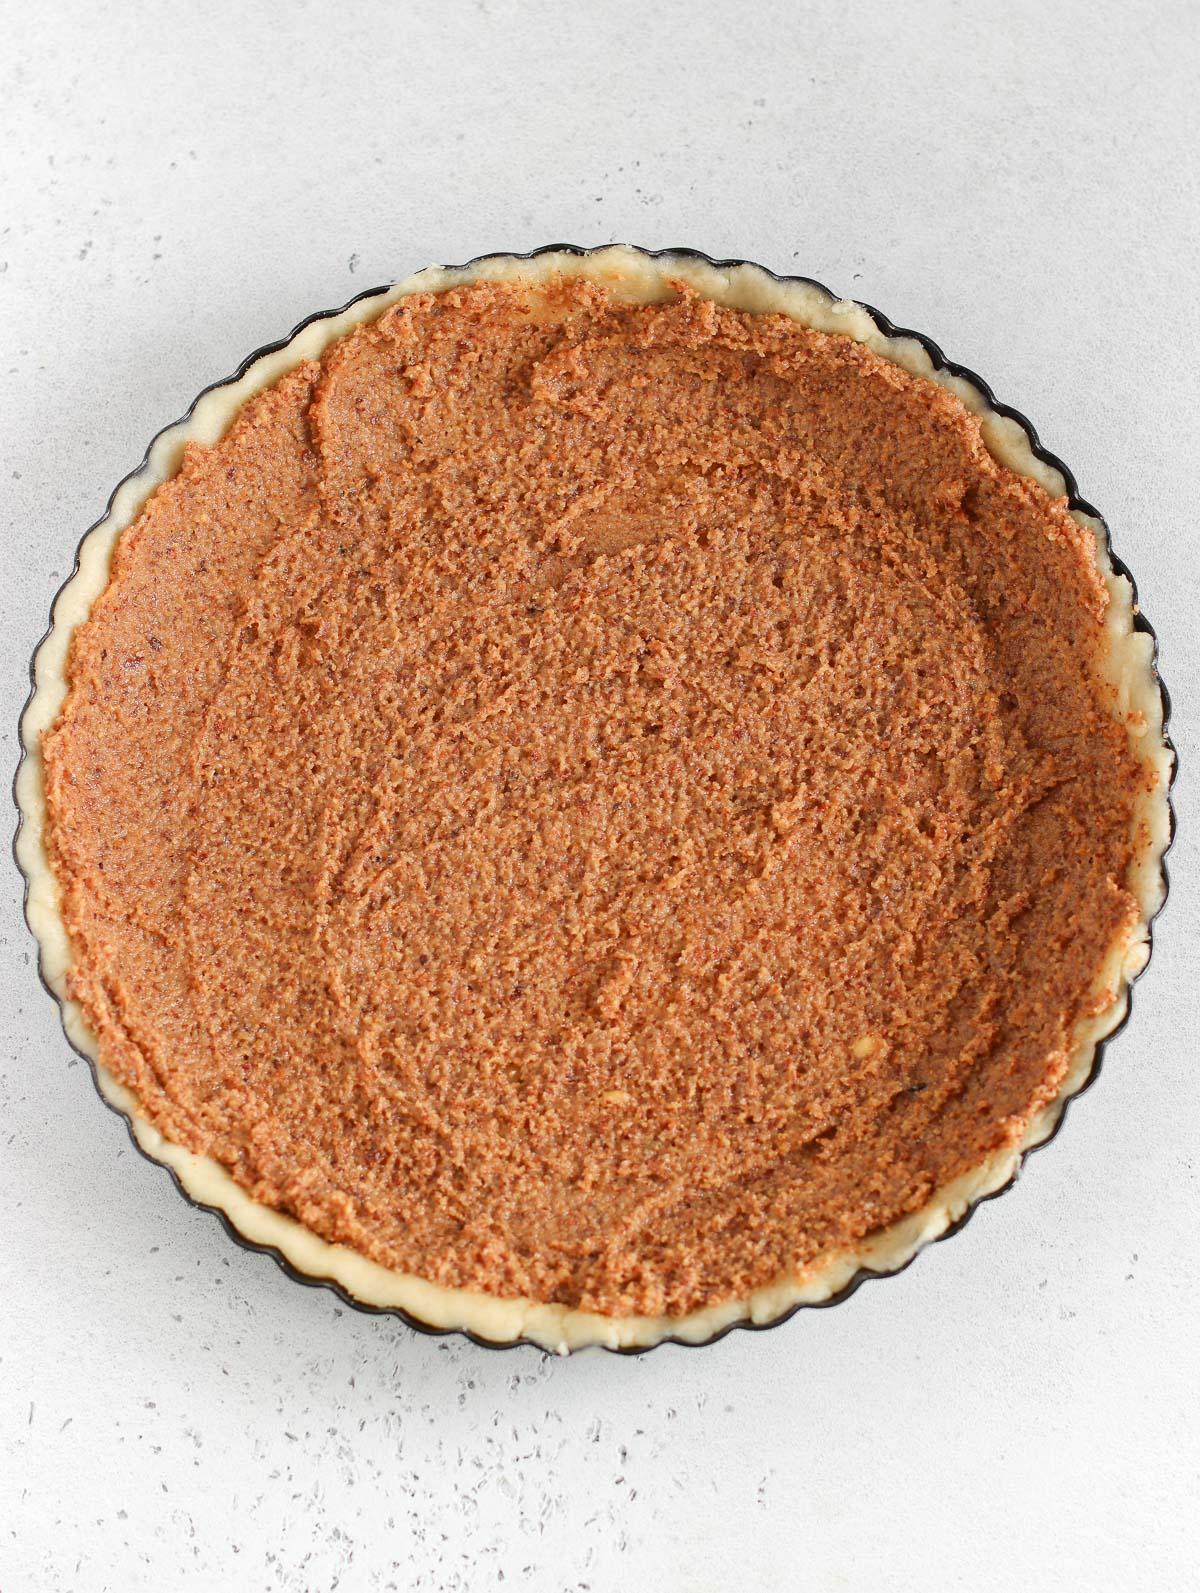 Spreading the frangipane on the pie crust